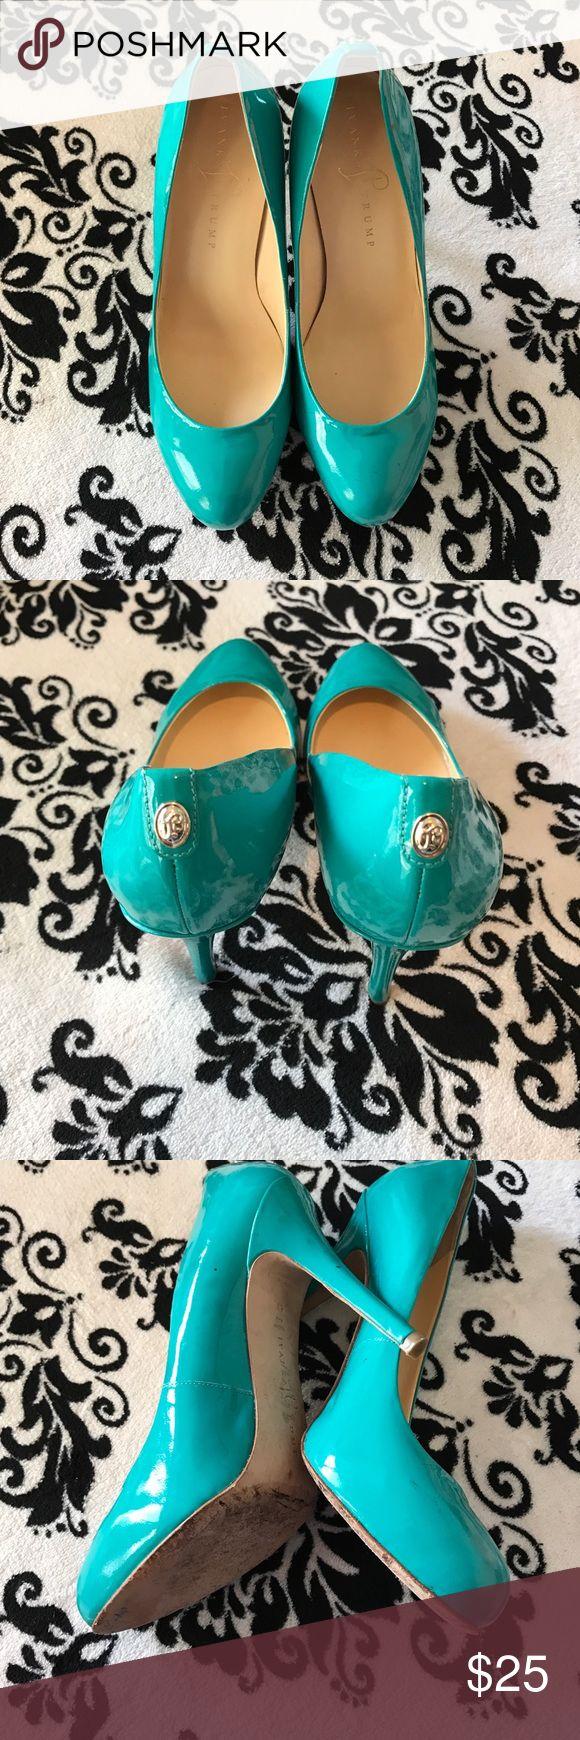 Ivanka trump heels Great condition Ivanka Trump Shoes Heels